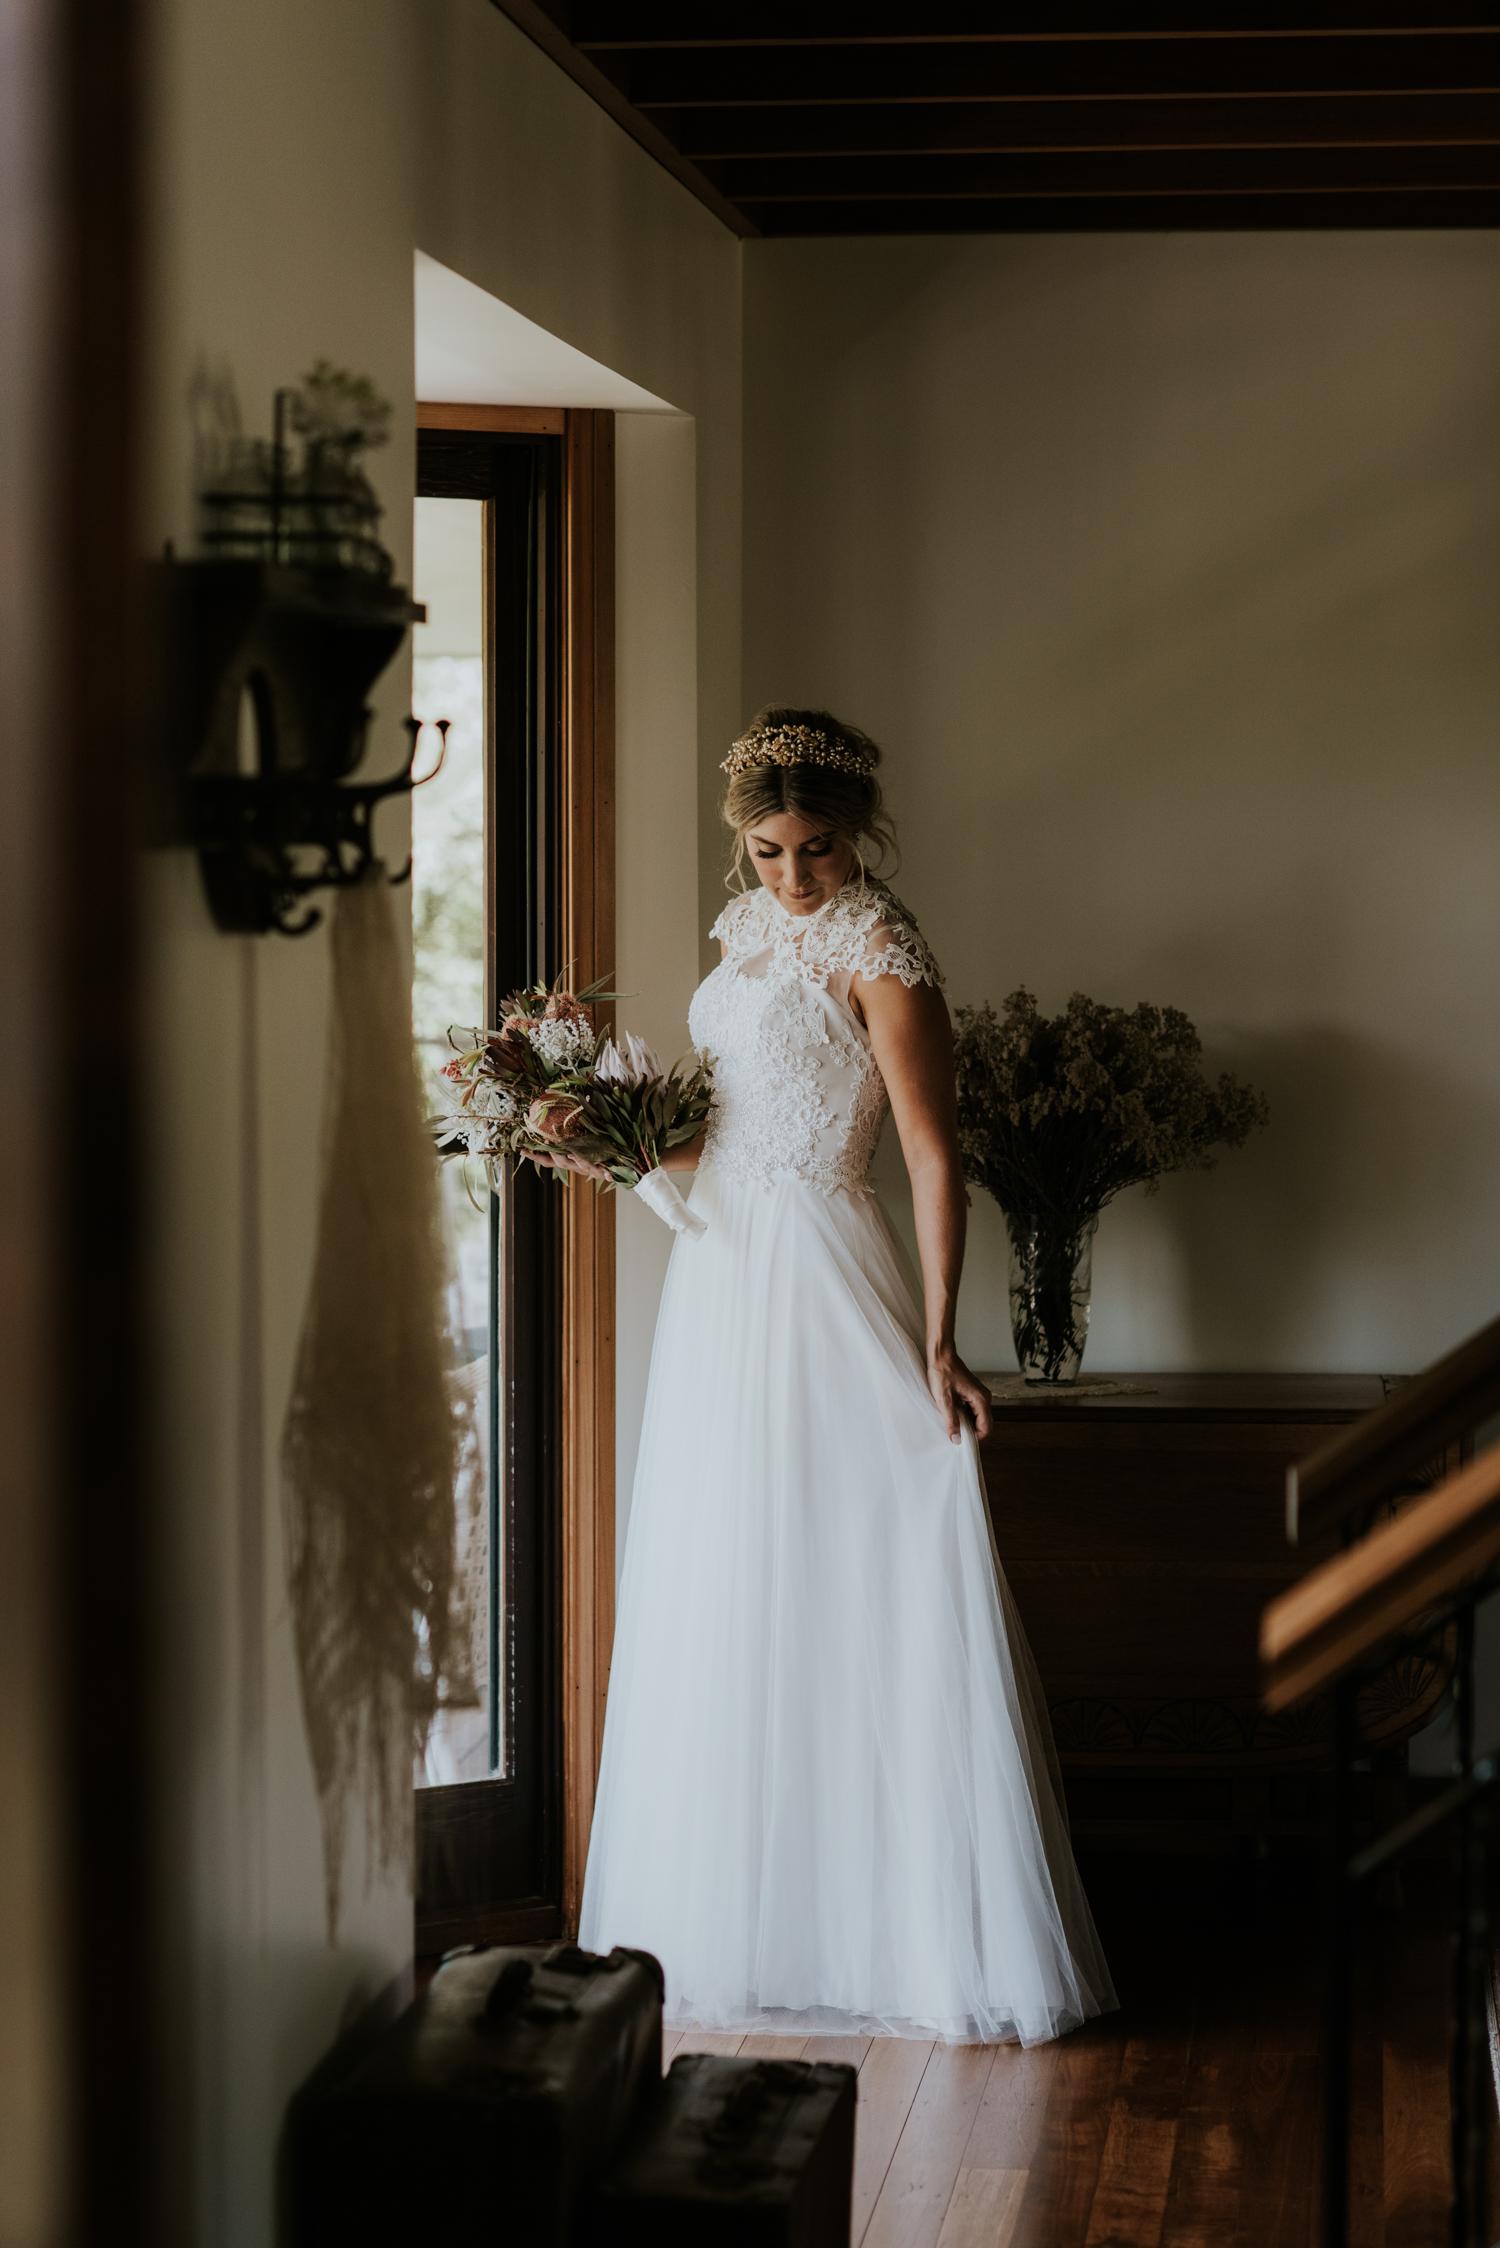 Byron Bay Wedding Photographer | Engagement-Elopement Photography-11.jpg